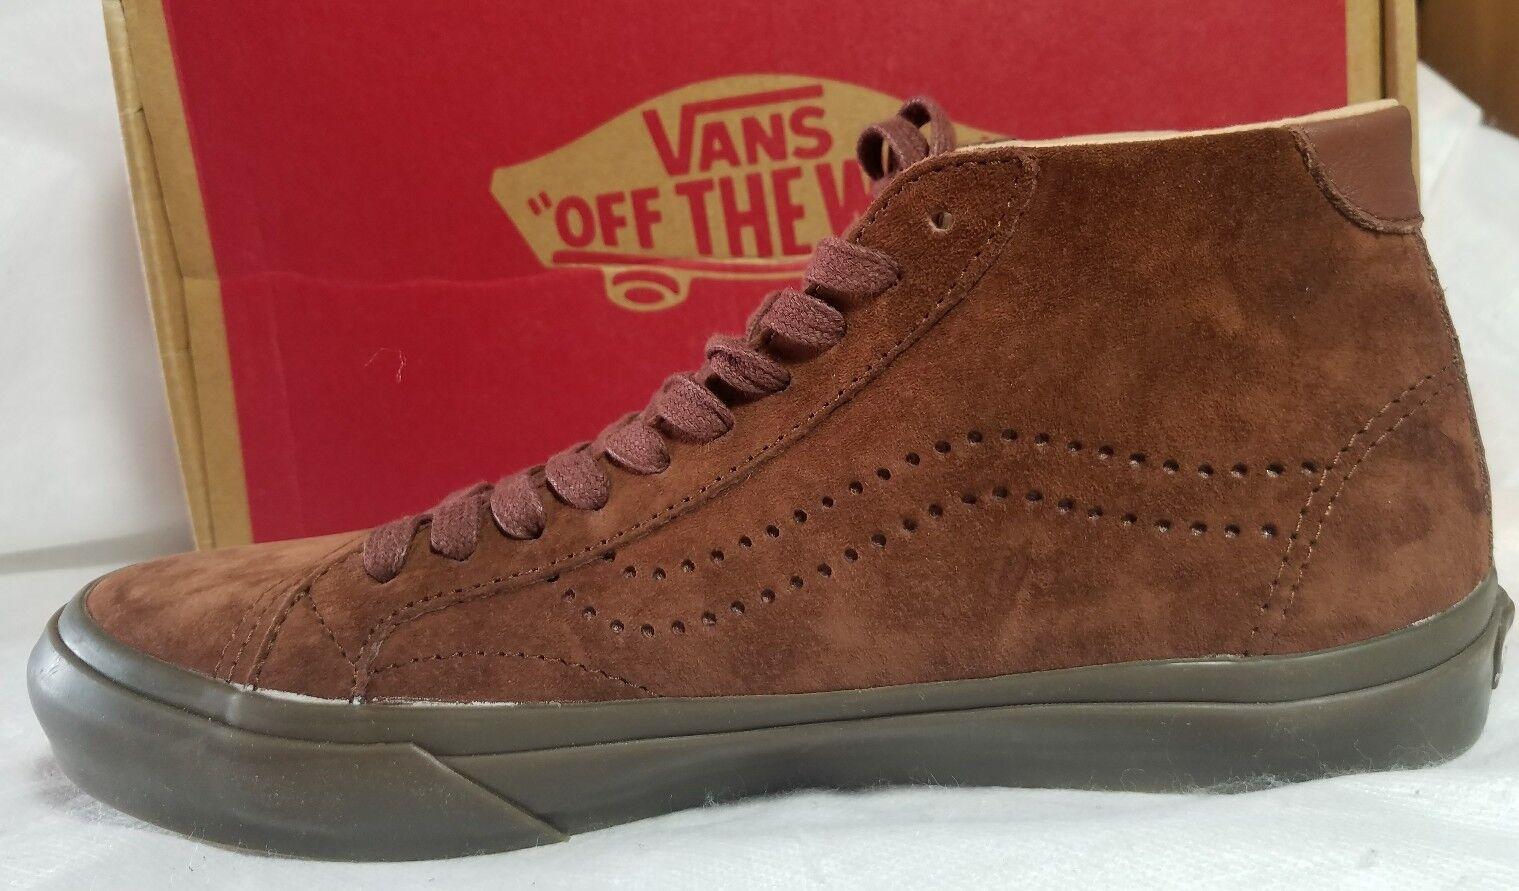 Vans Court Mid DX Tanner Leather Suede Cappuccino Brown Dark Gum shoes Men 6.5